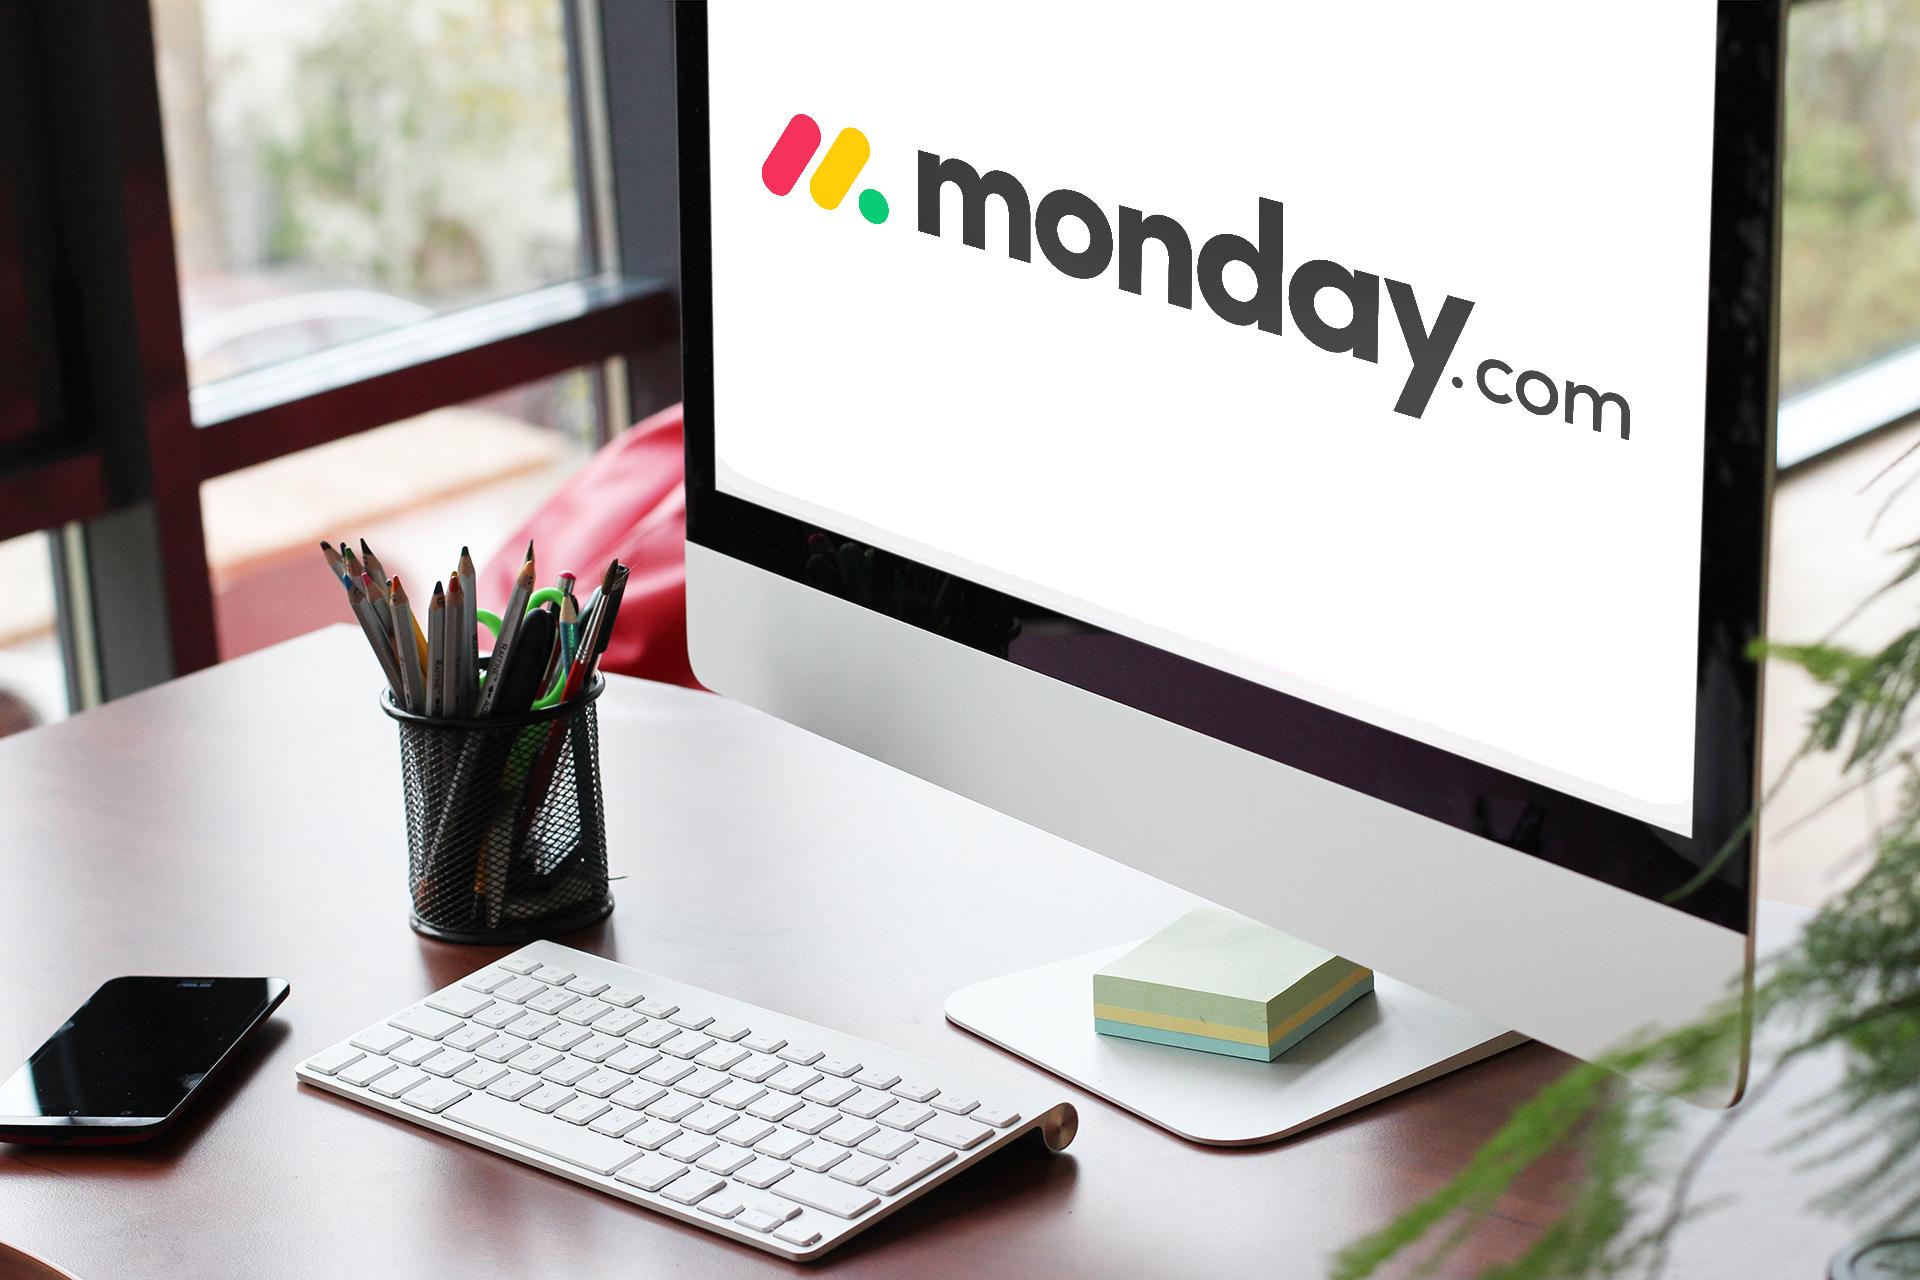 Monday.com Initial Public Offering